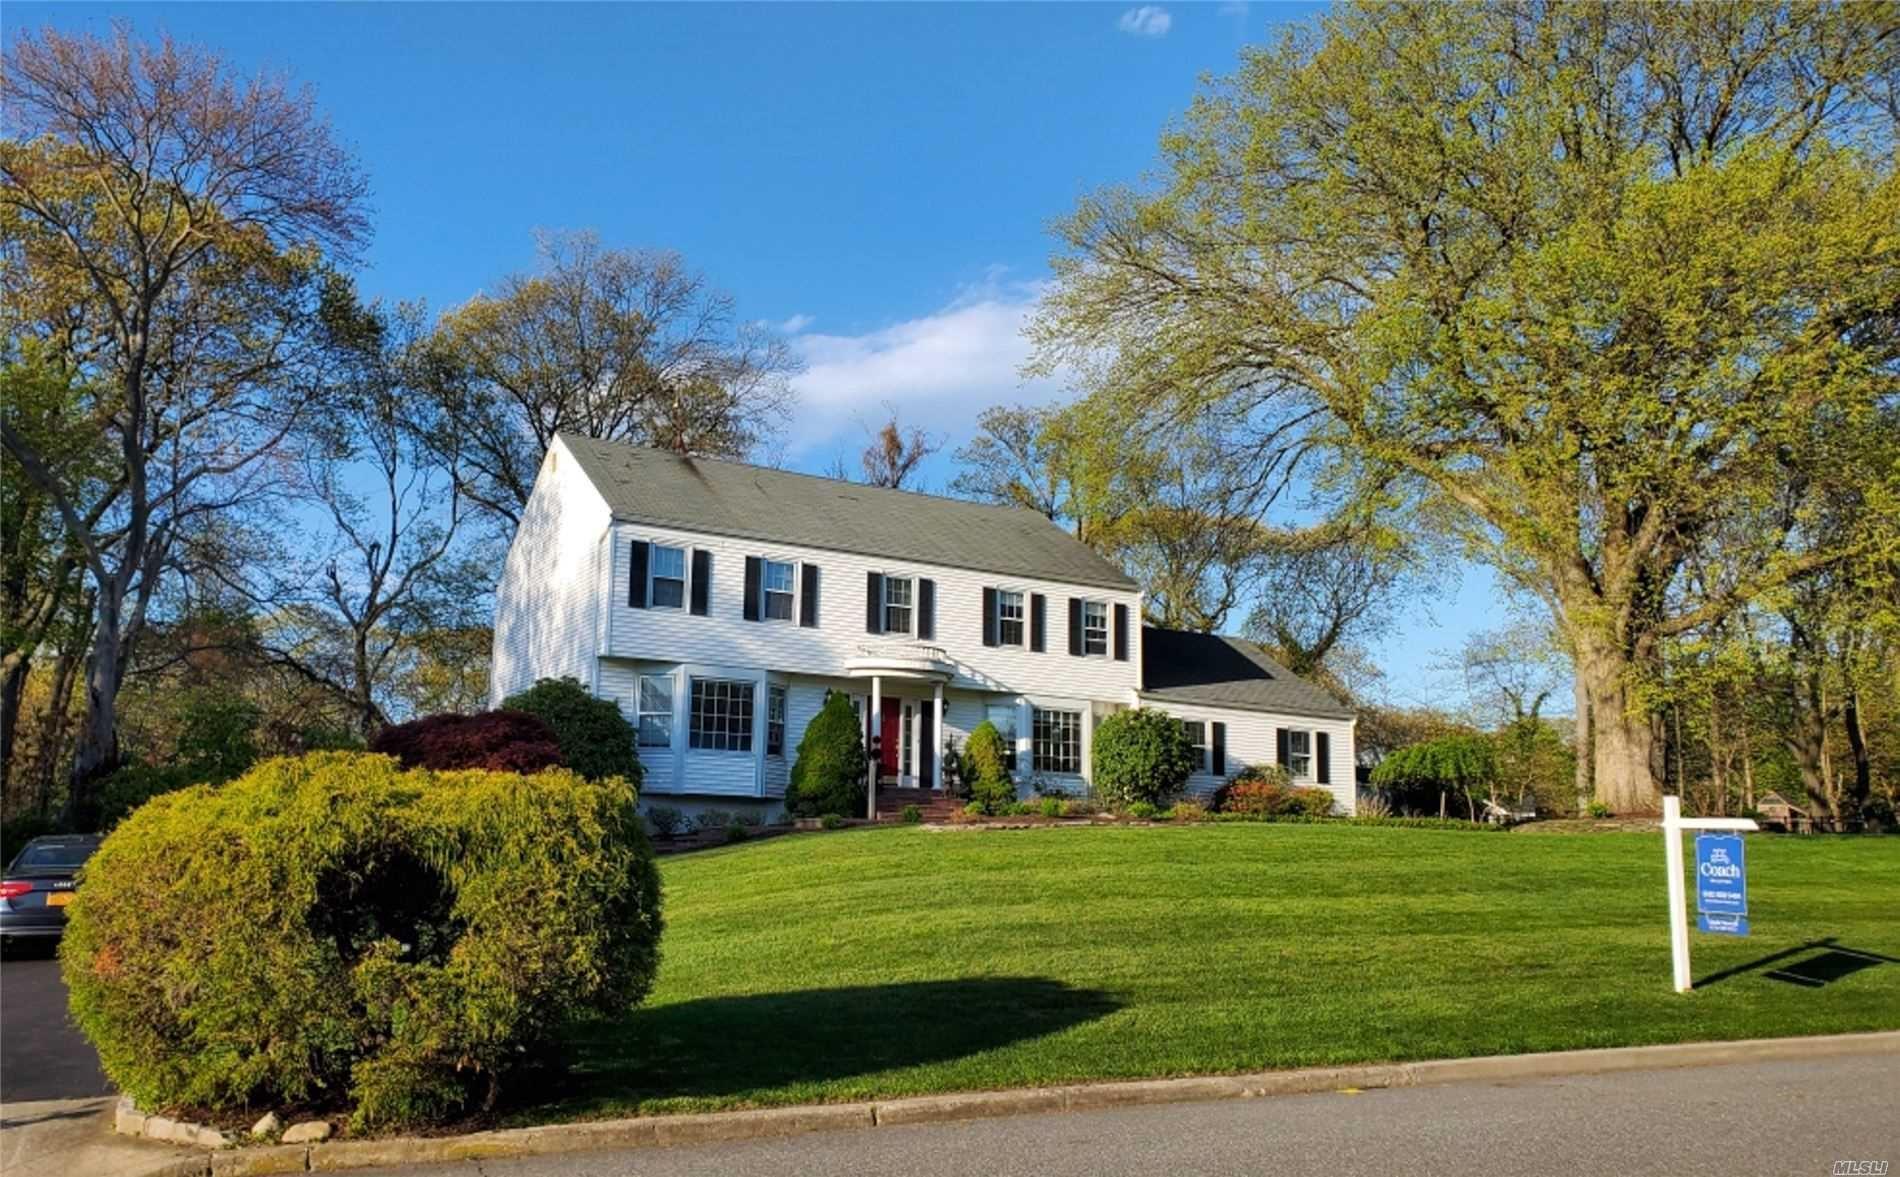 21 Audubon Gate, Miller Place, NY 11764 - MLS#: 3202869